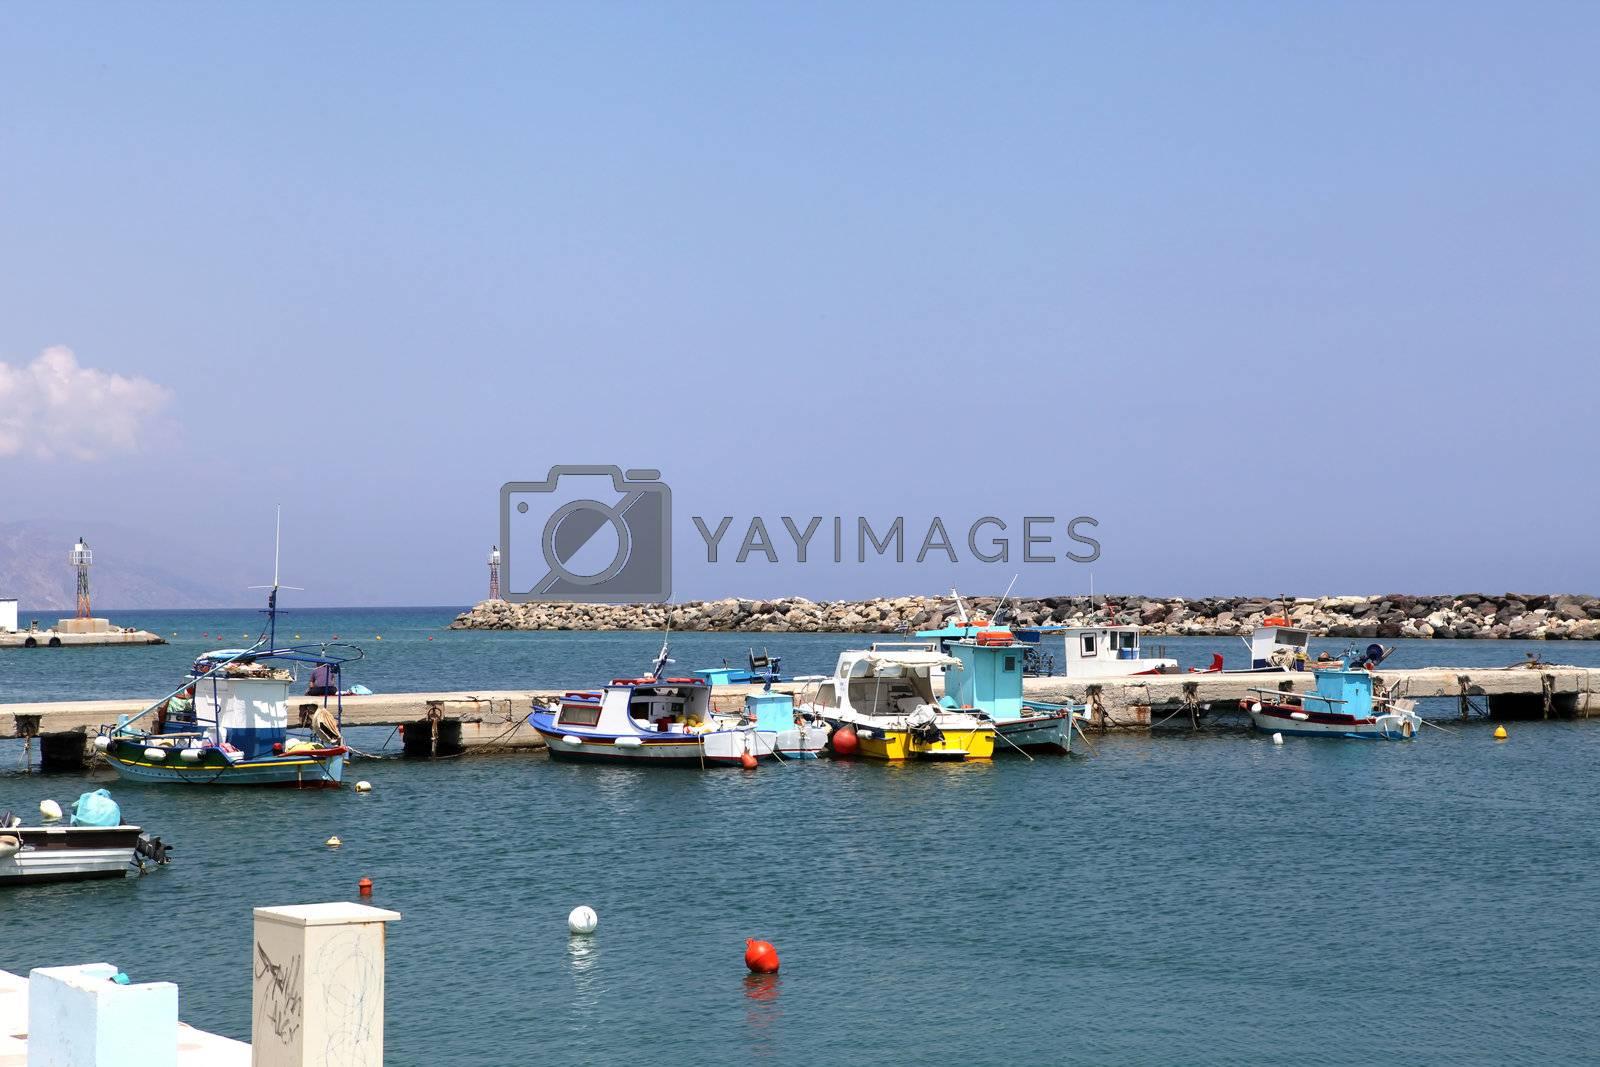 Kardamena resort and port on the island of Kos